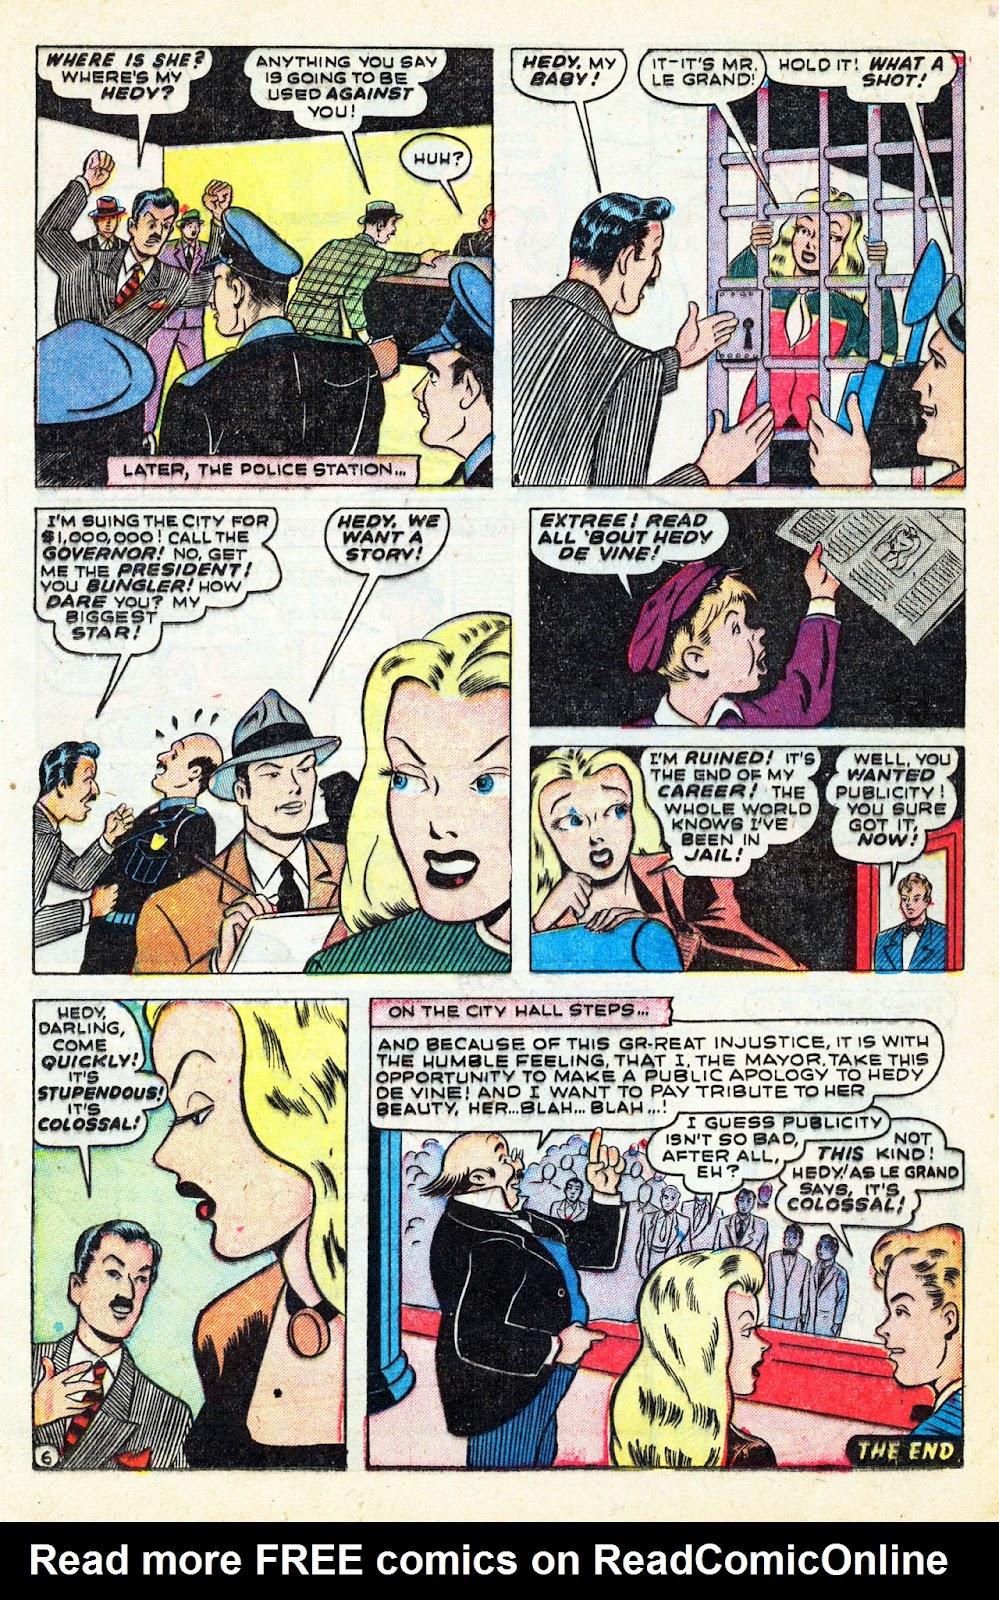 Read online Gay Comics comic -  Issue #35 - 24